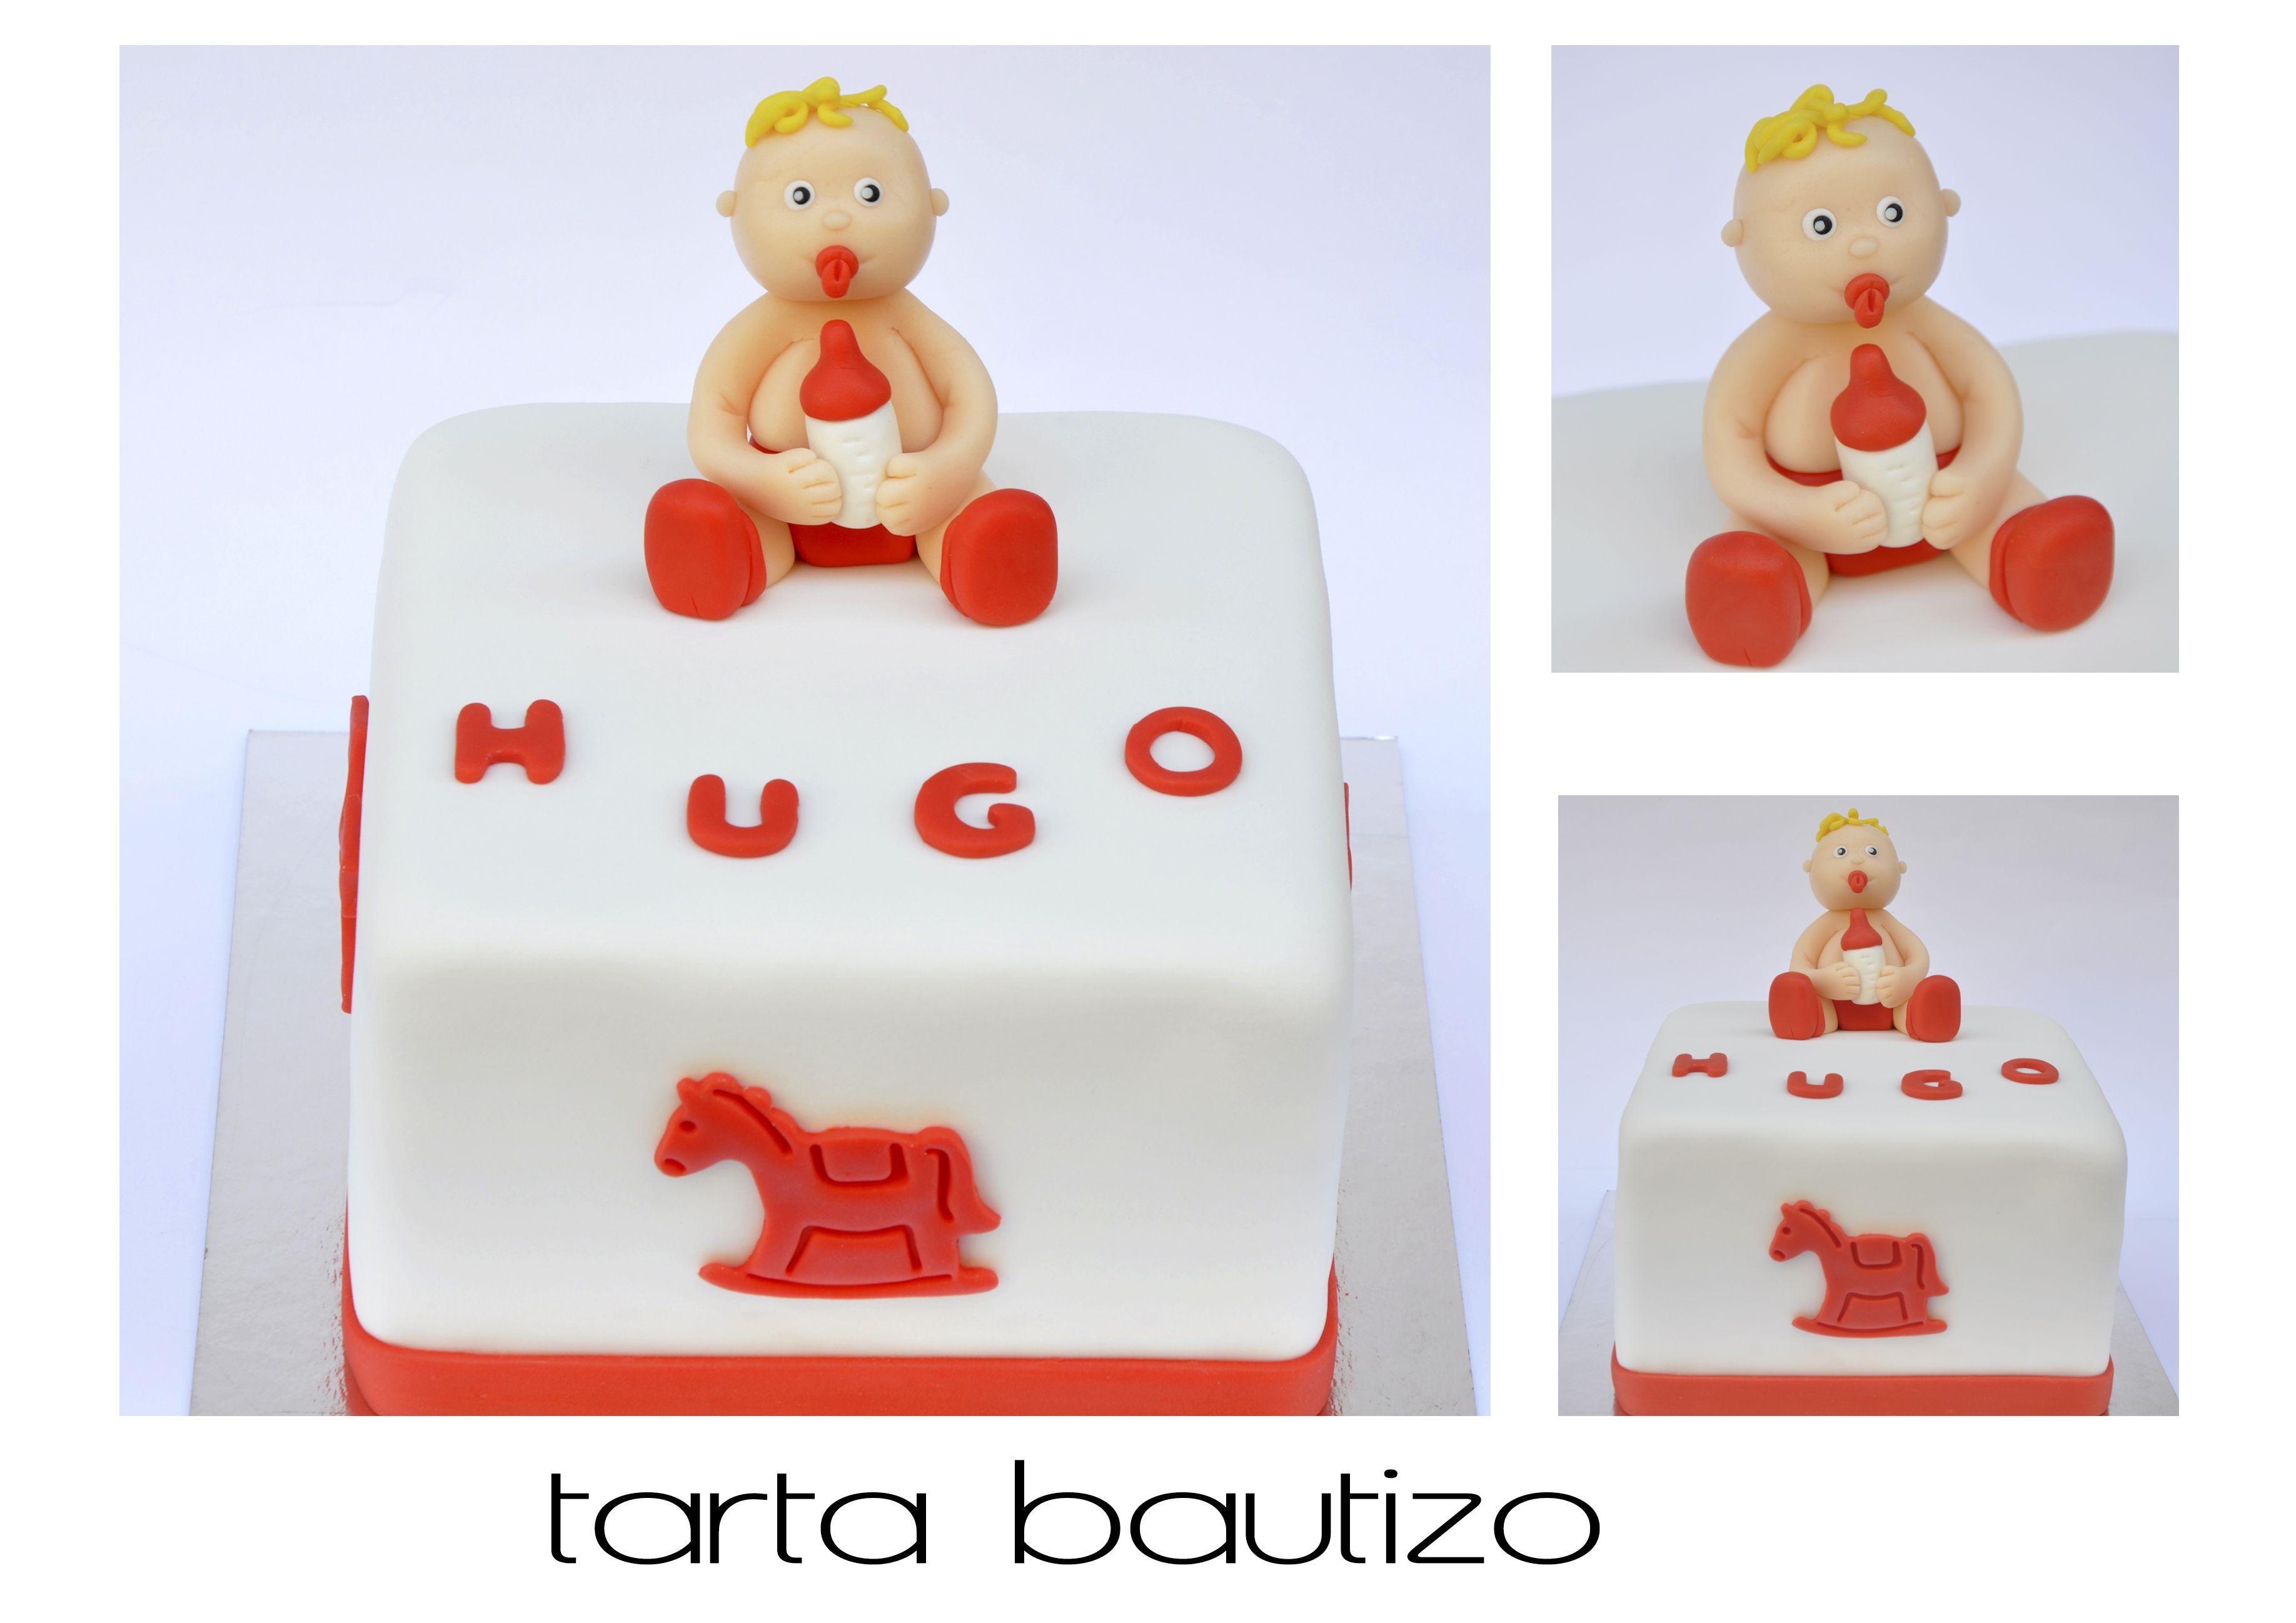 tarta bautizo, roja, original, madrid. acaramelada.com